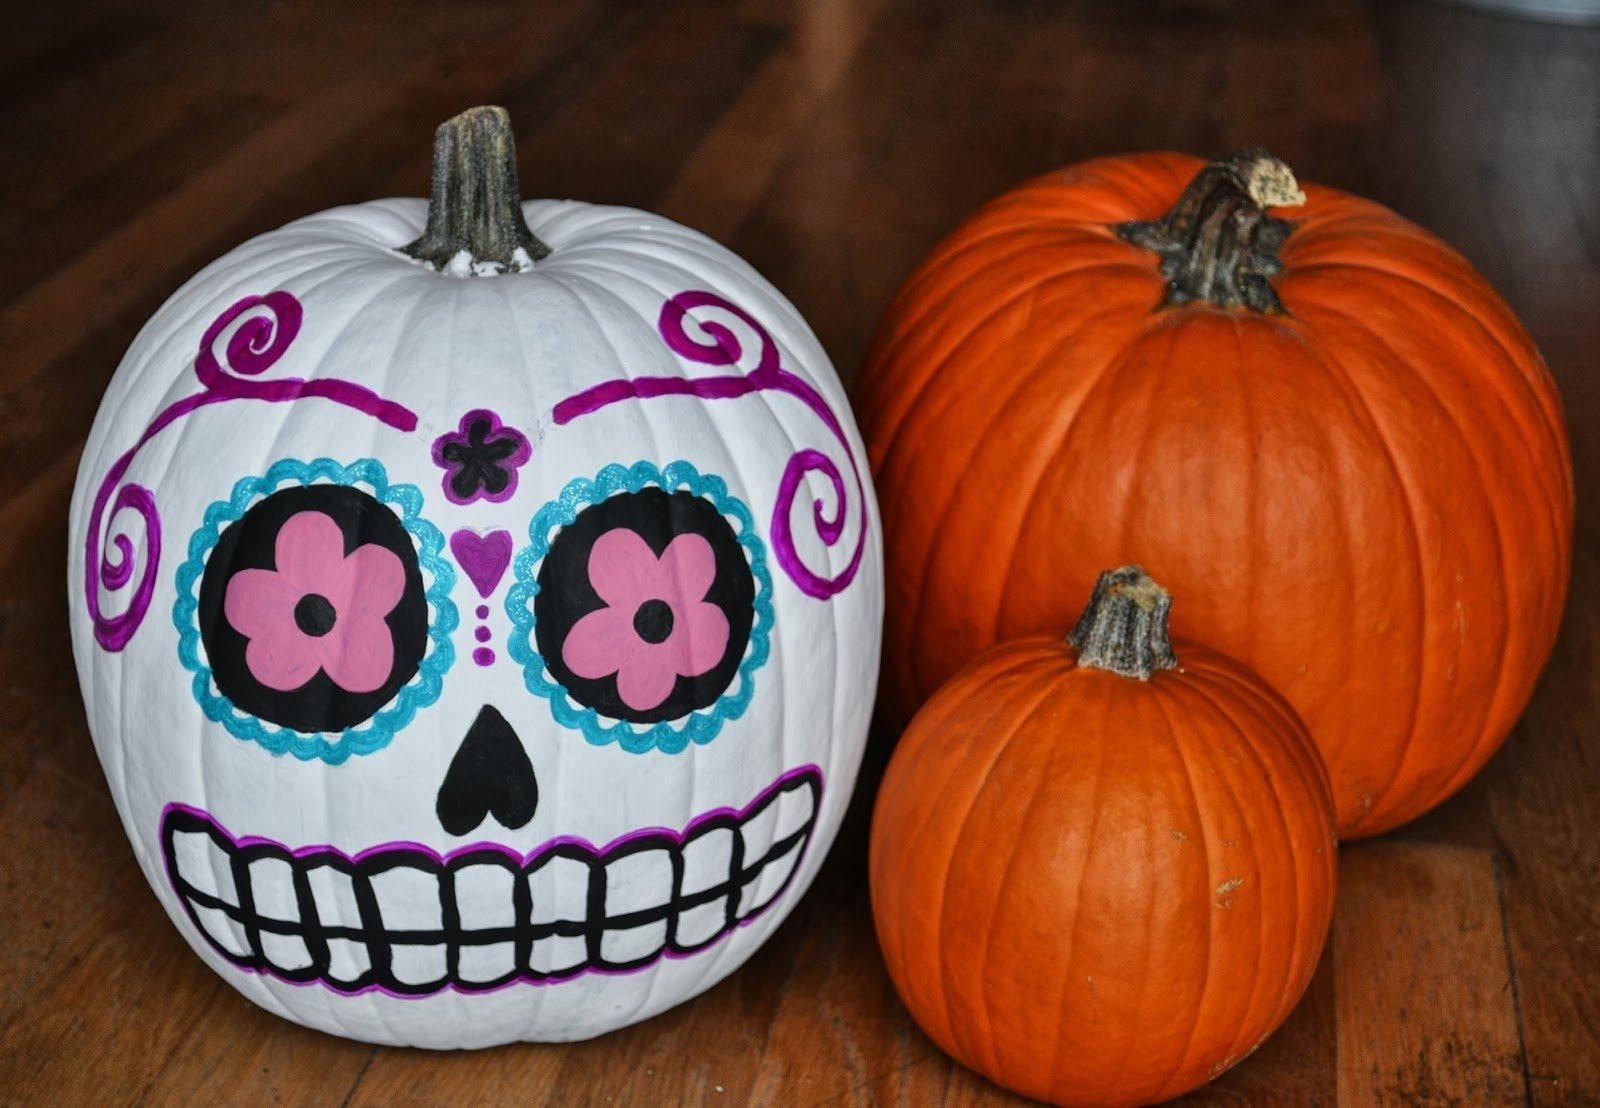 10 Fashionable Creative Pumpkin Ideas No Carving pumpkin carving ideas sunset for halloween easy no di bedroom 2020